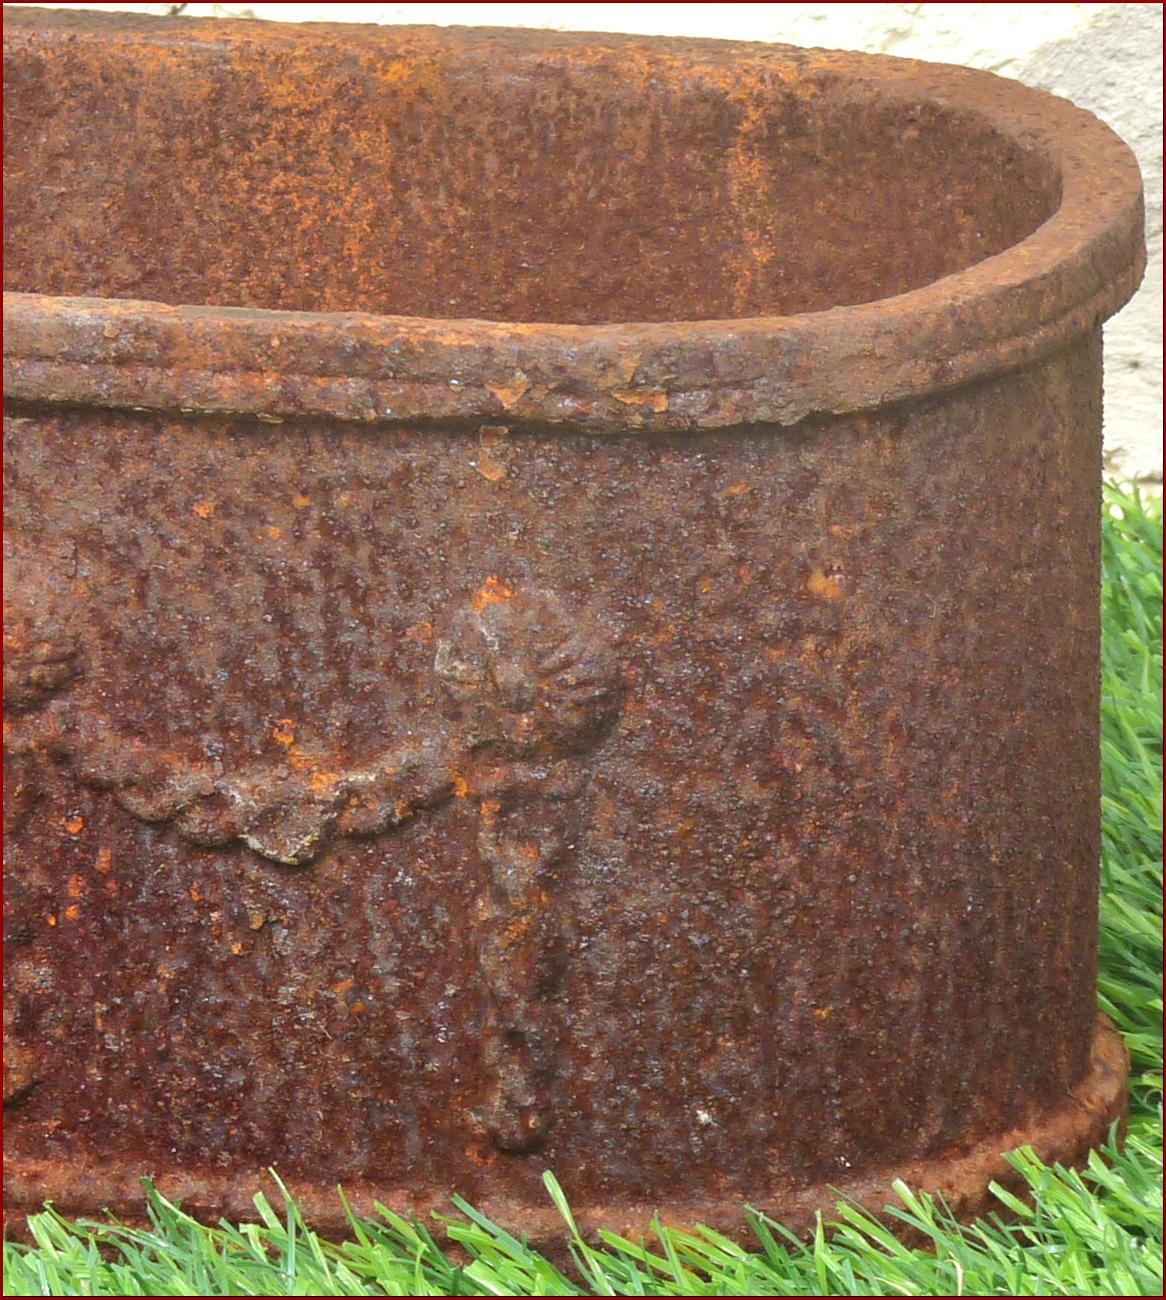 jardiniere bac pot vasque en fonte de jardin fenetre ebay